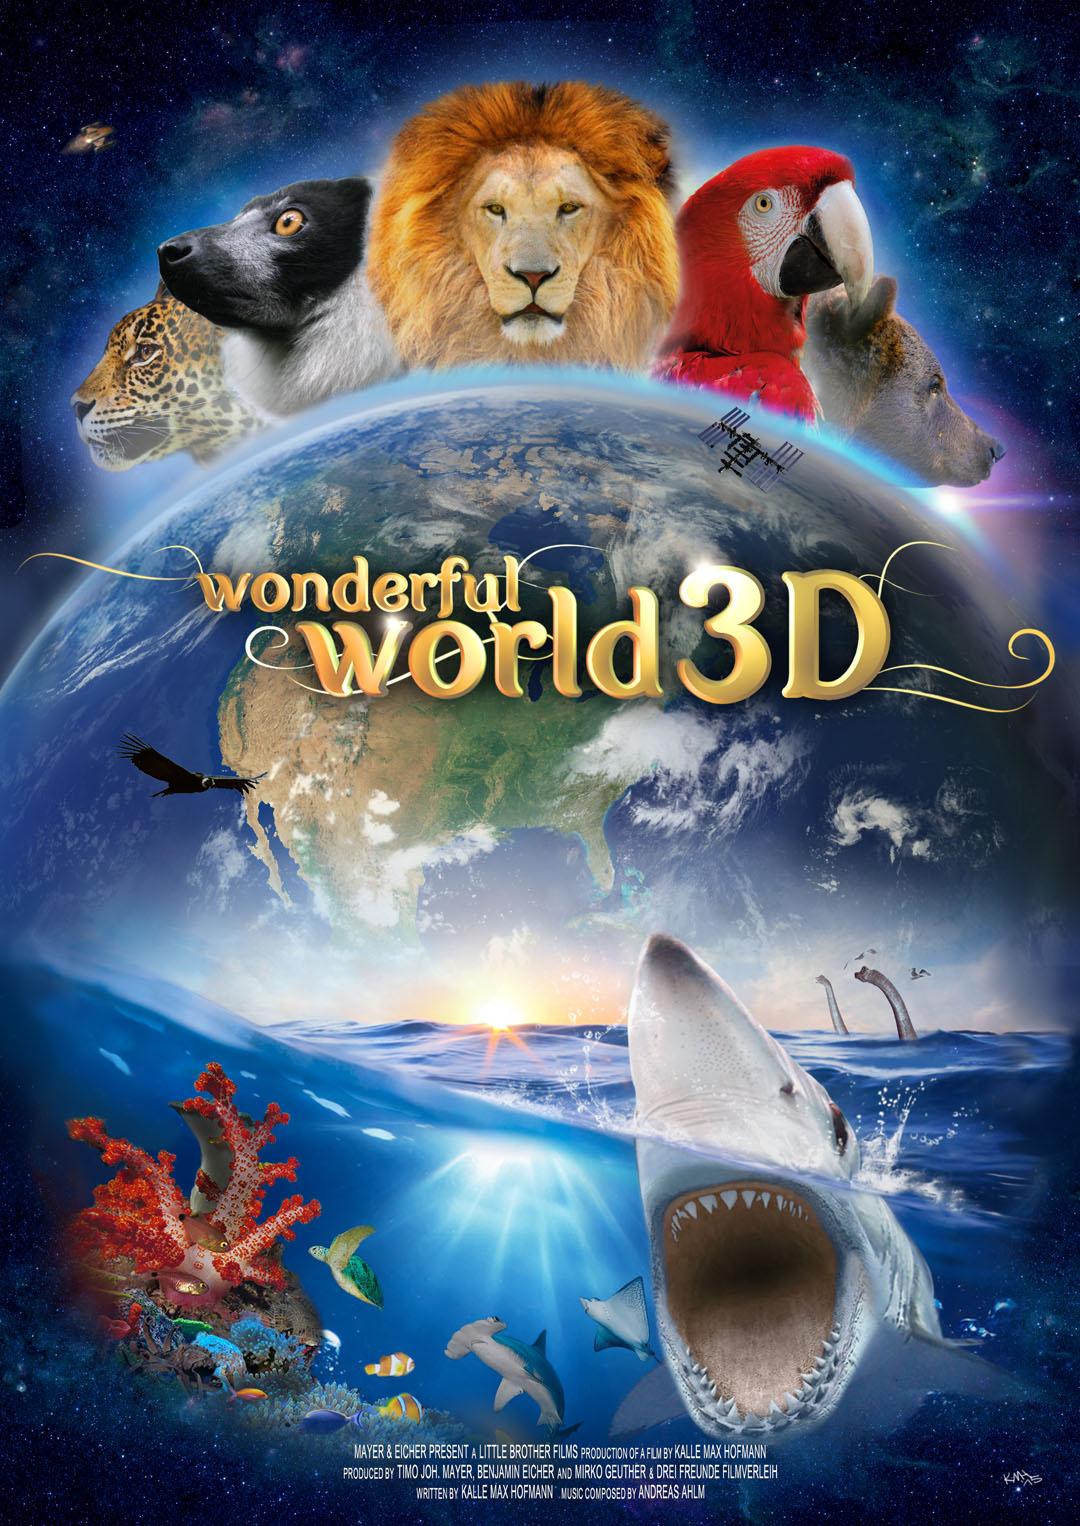 Wonderful World 3D (2015) - Photo Gallery - IMDb